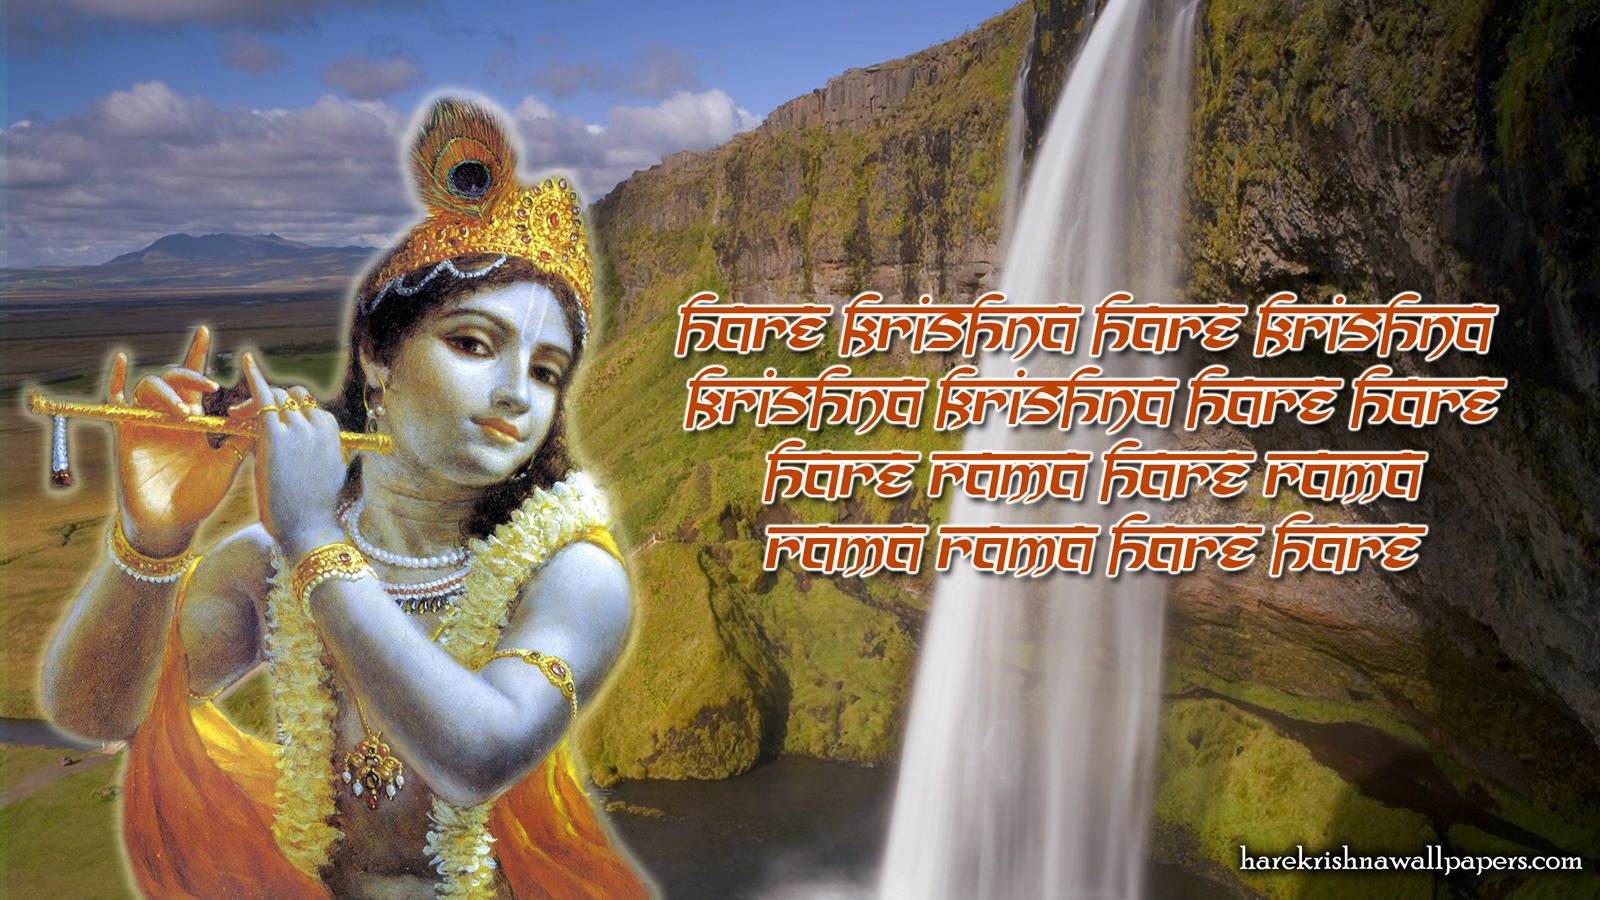 Chant Hare Krishna Mahamantra Wallpaper (002) Size 1600x900 Download